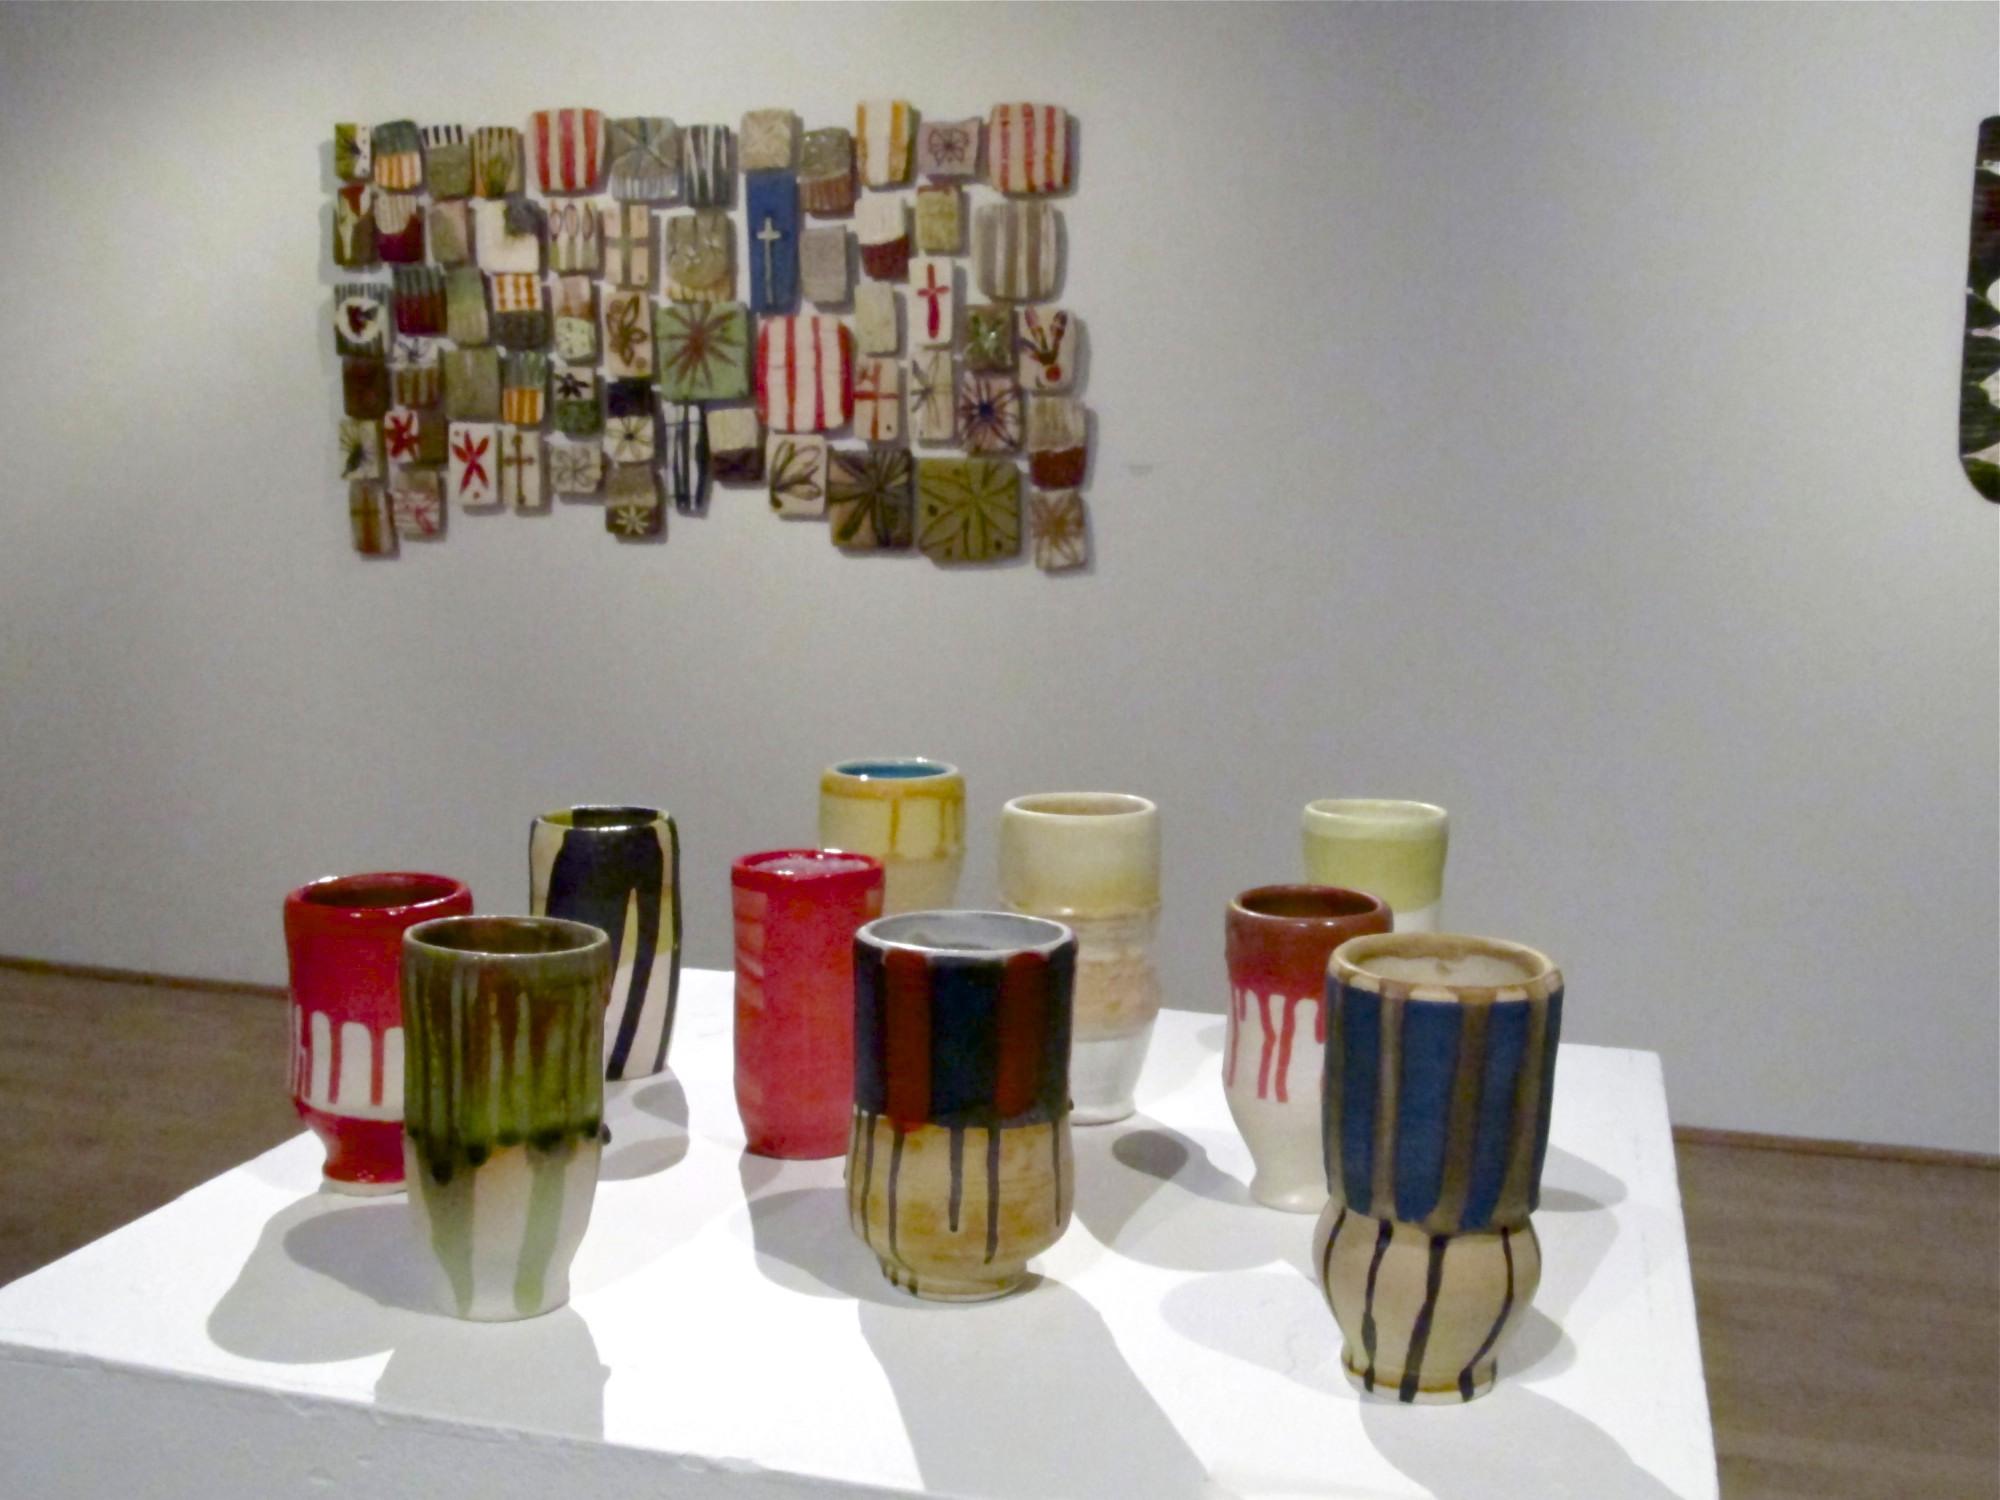 Gallery - exhibition/installation view